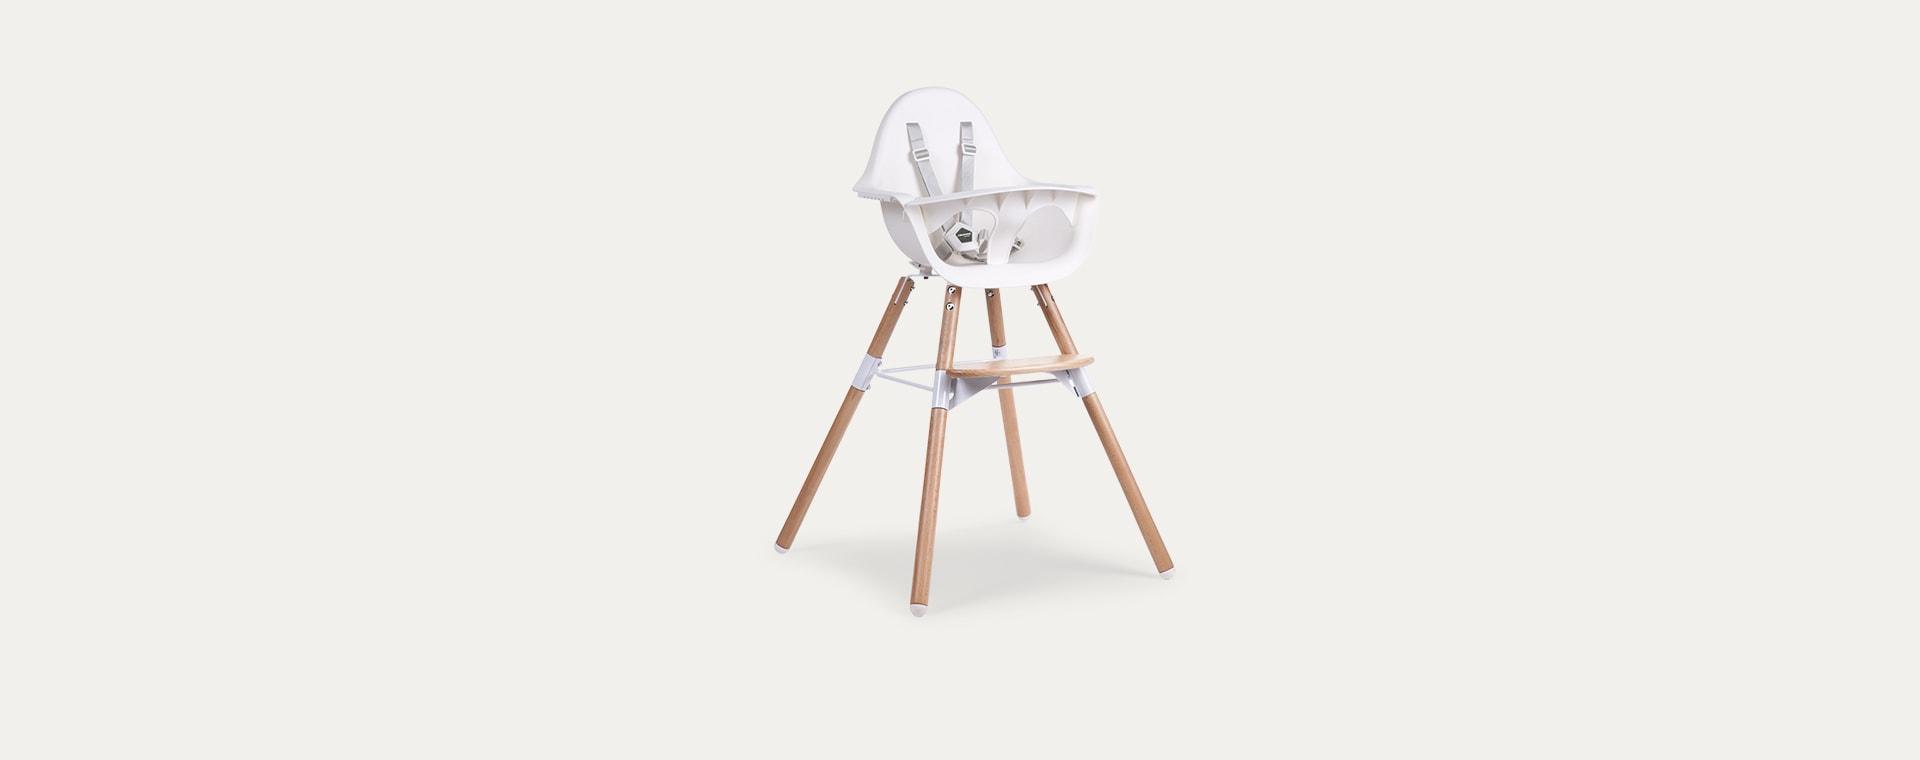 White Childhome Evolu 2 Chair 2 in 1 + Bumper